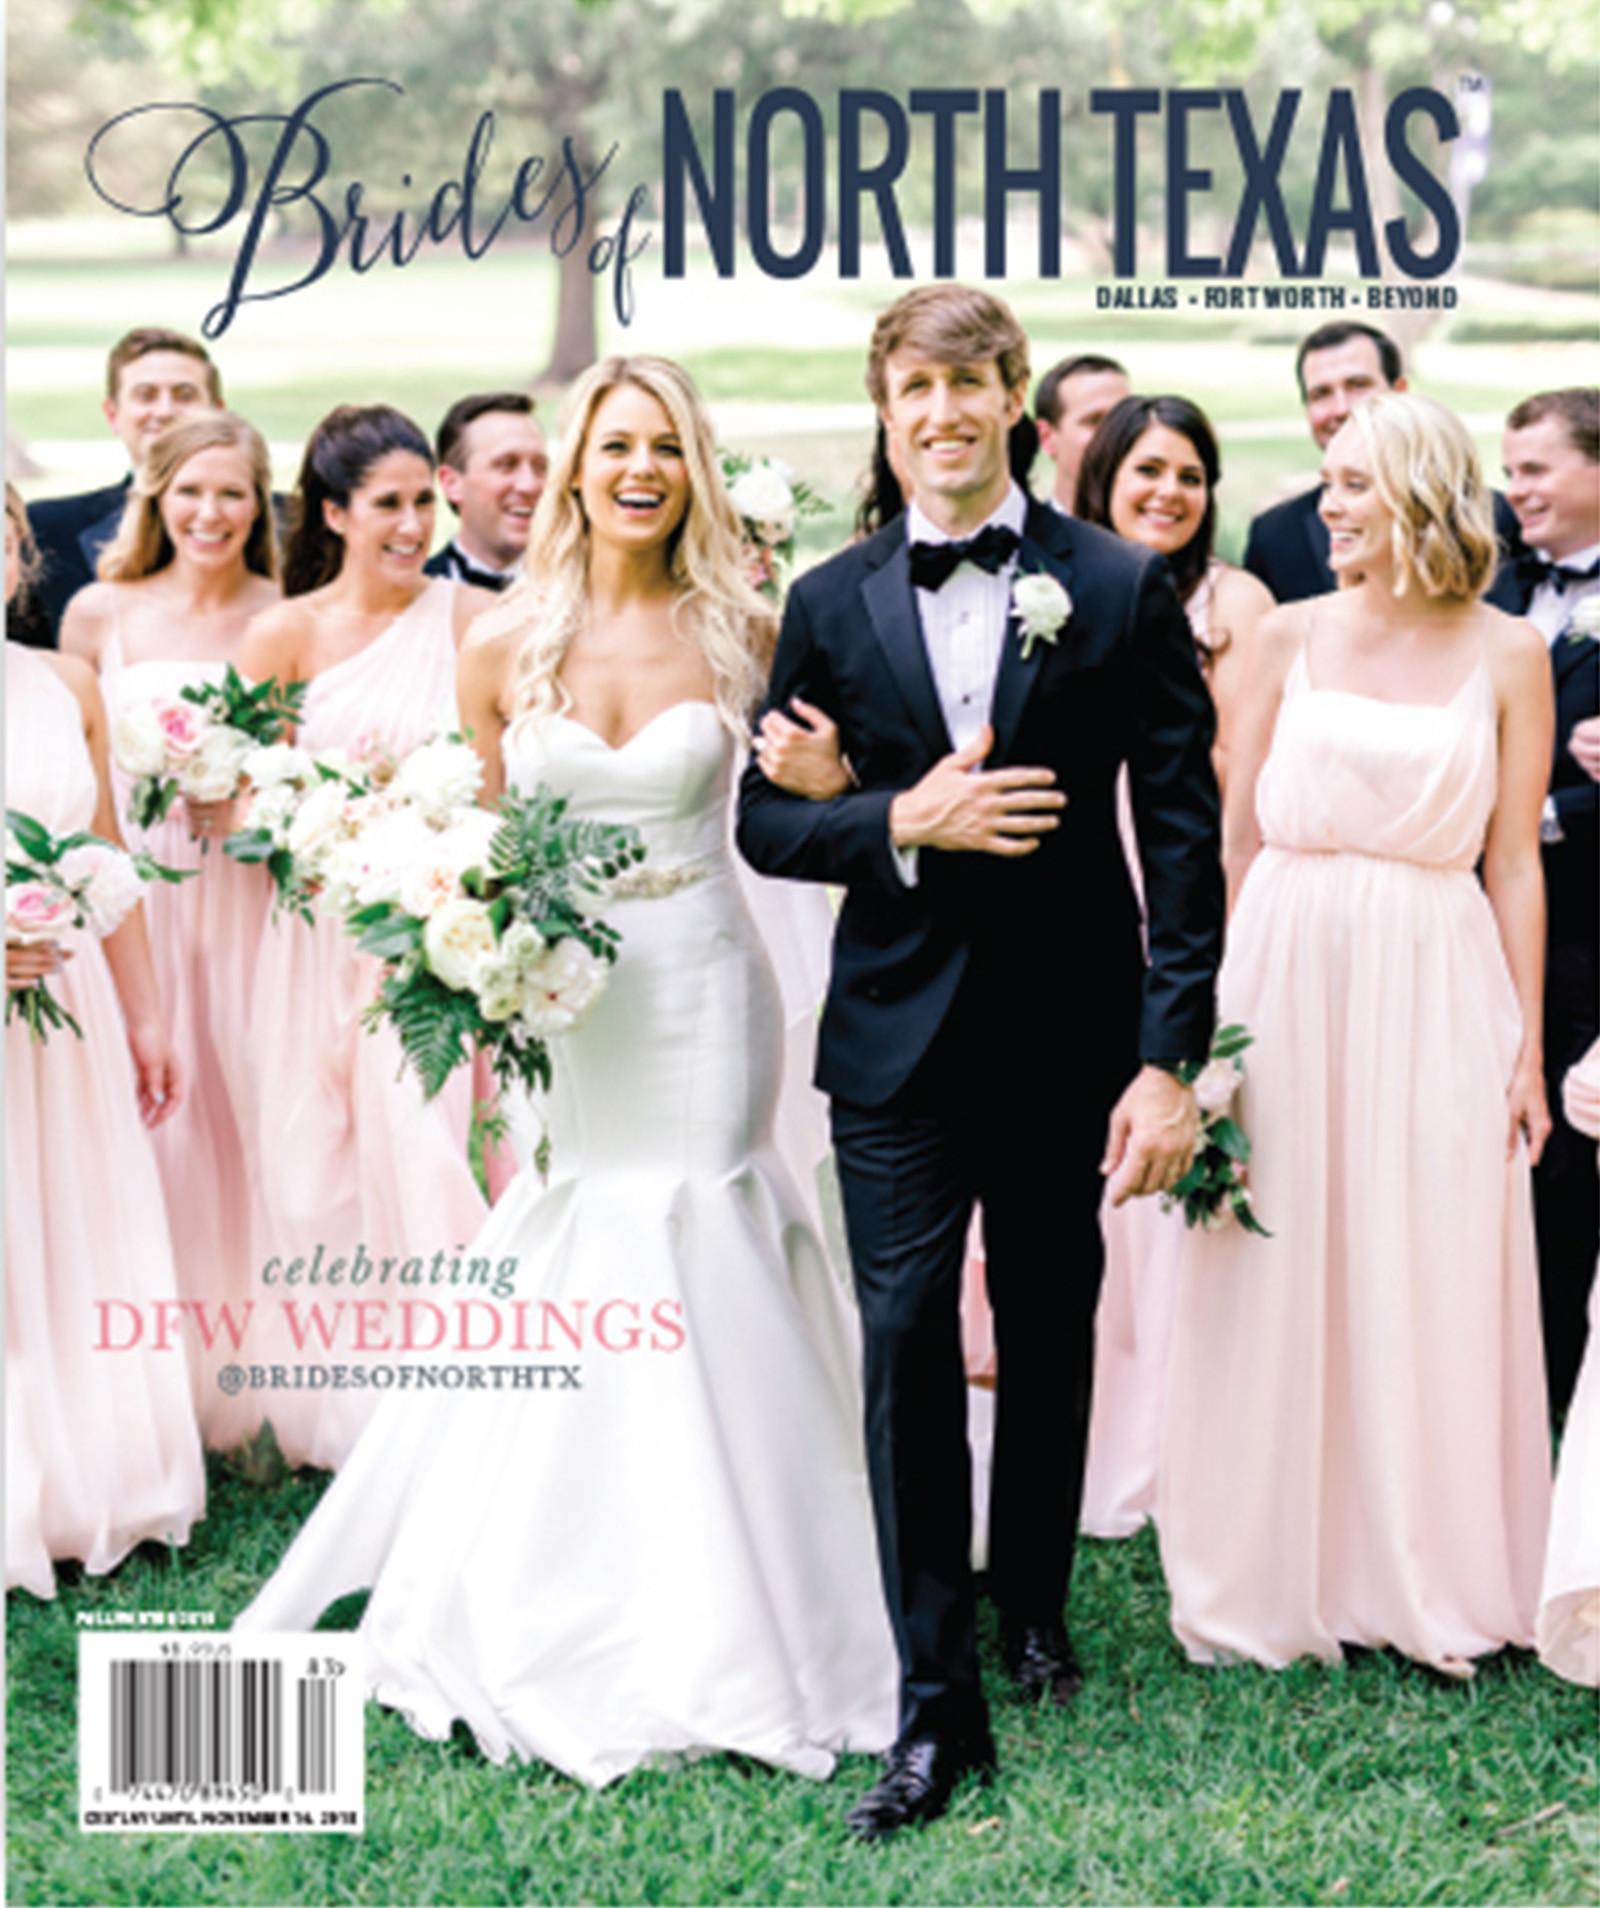 Gaun Pengantin Muslimah Modern Warna Gold Lovely Real Weddings Featured In Brides Of north Texas